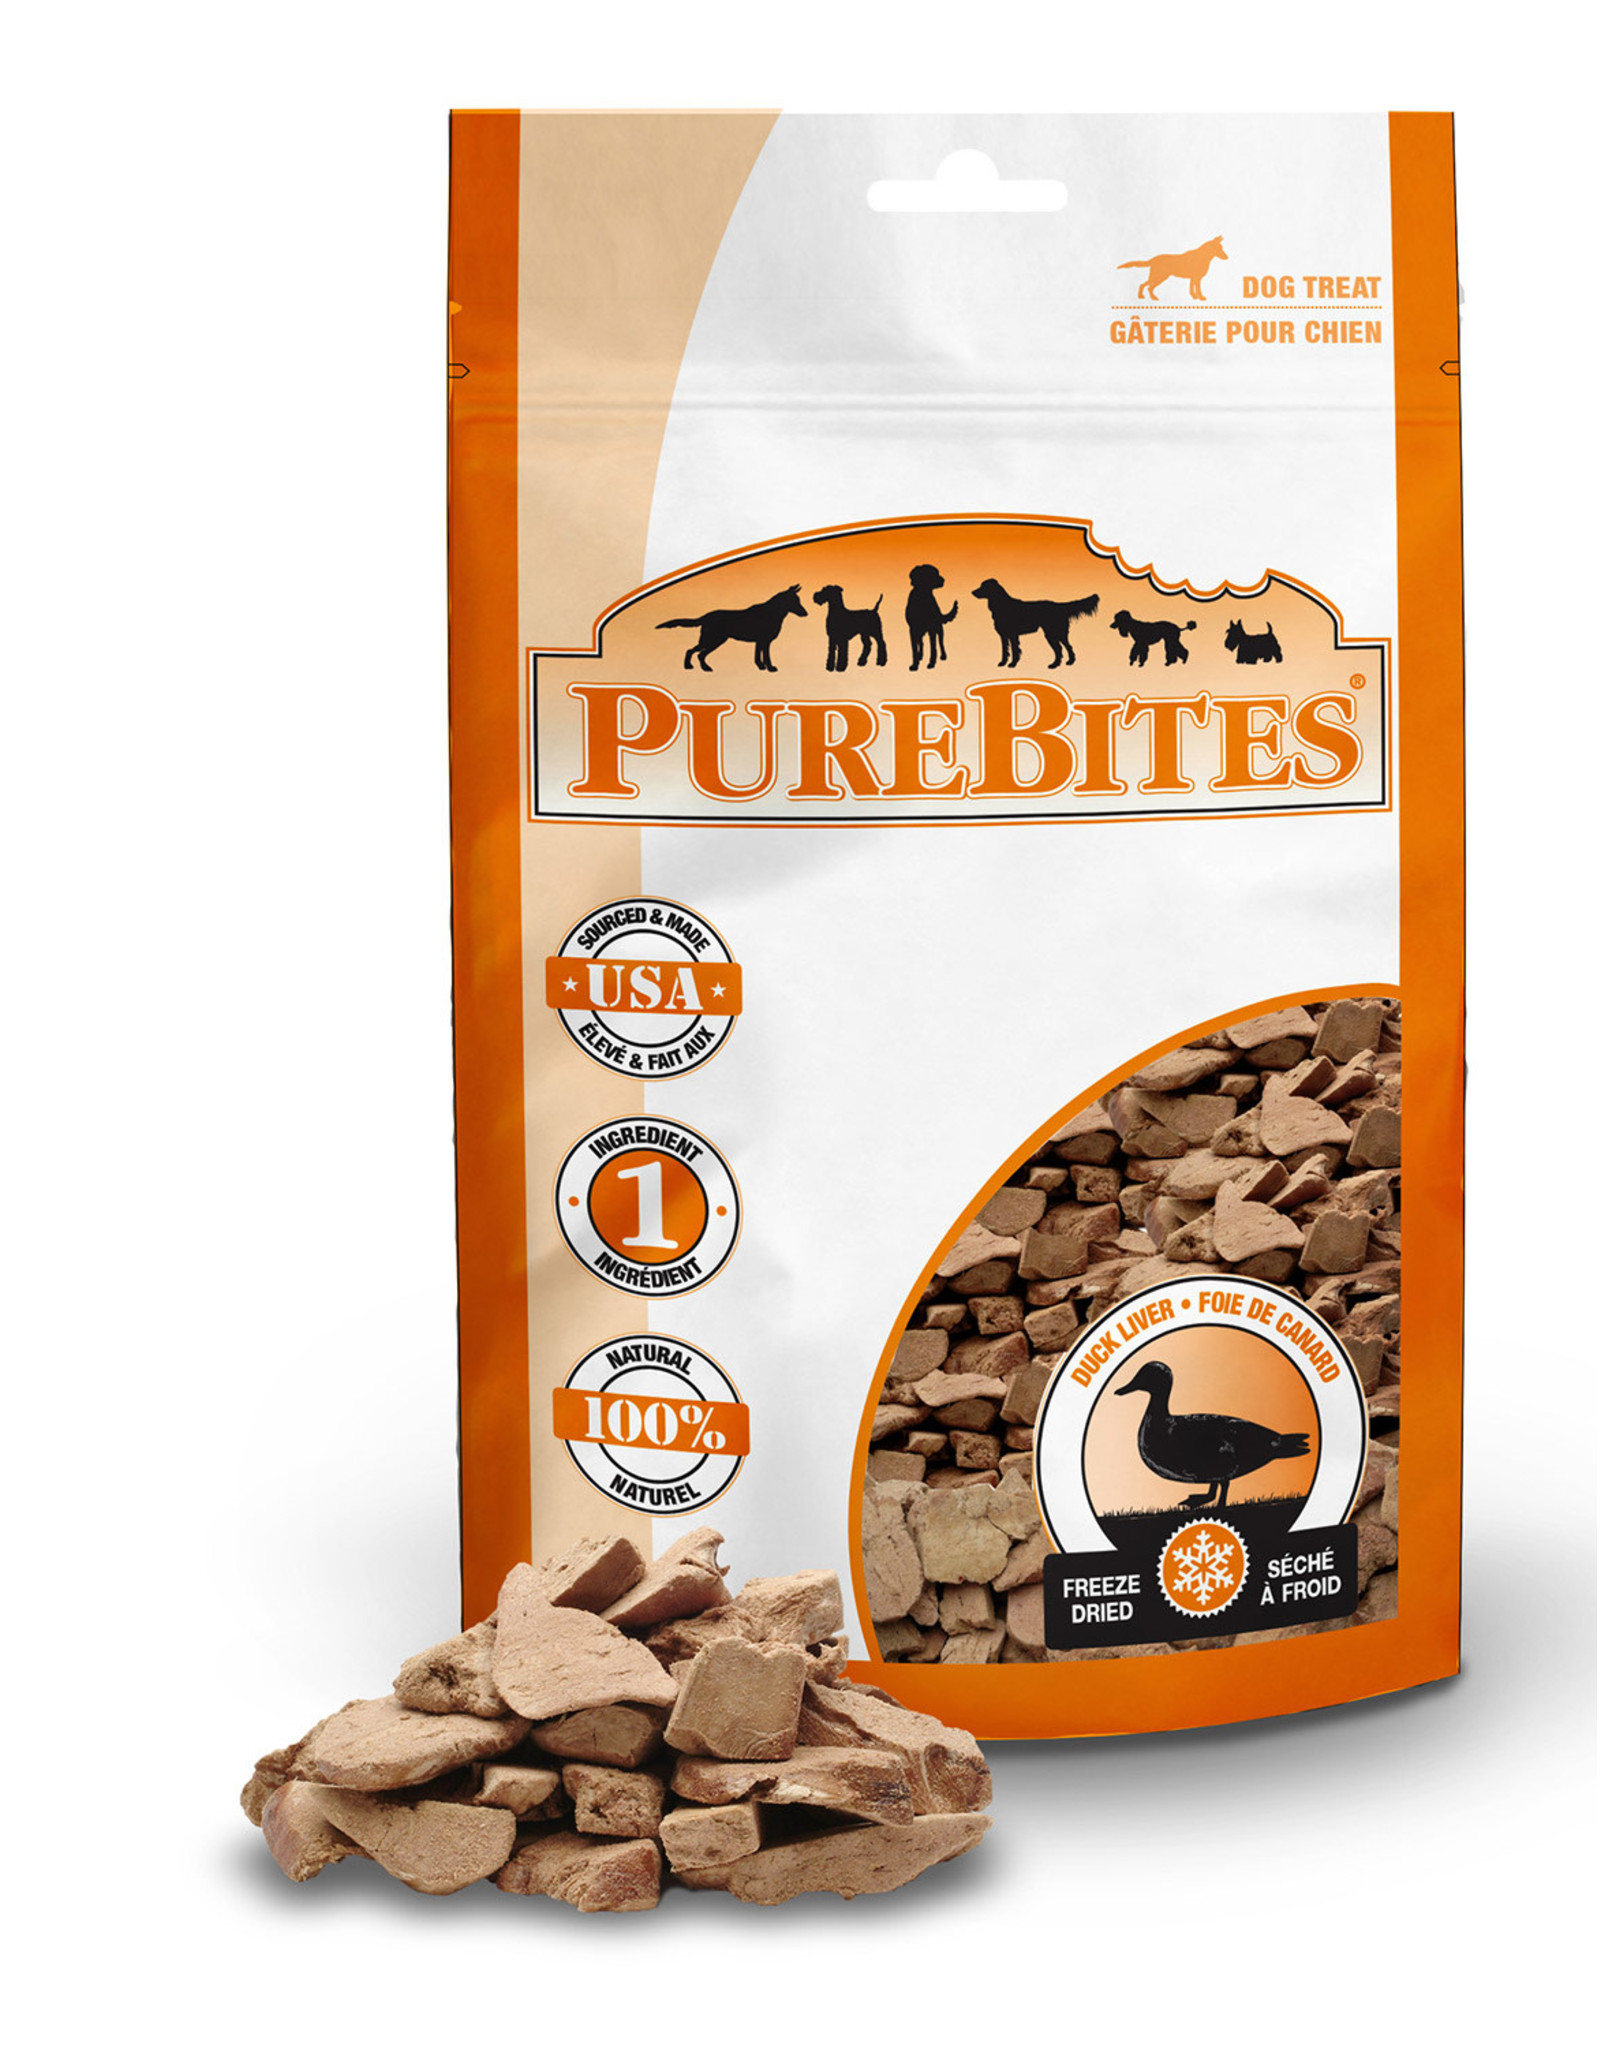 Pure Bites Purebites - Duck Treat 35g